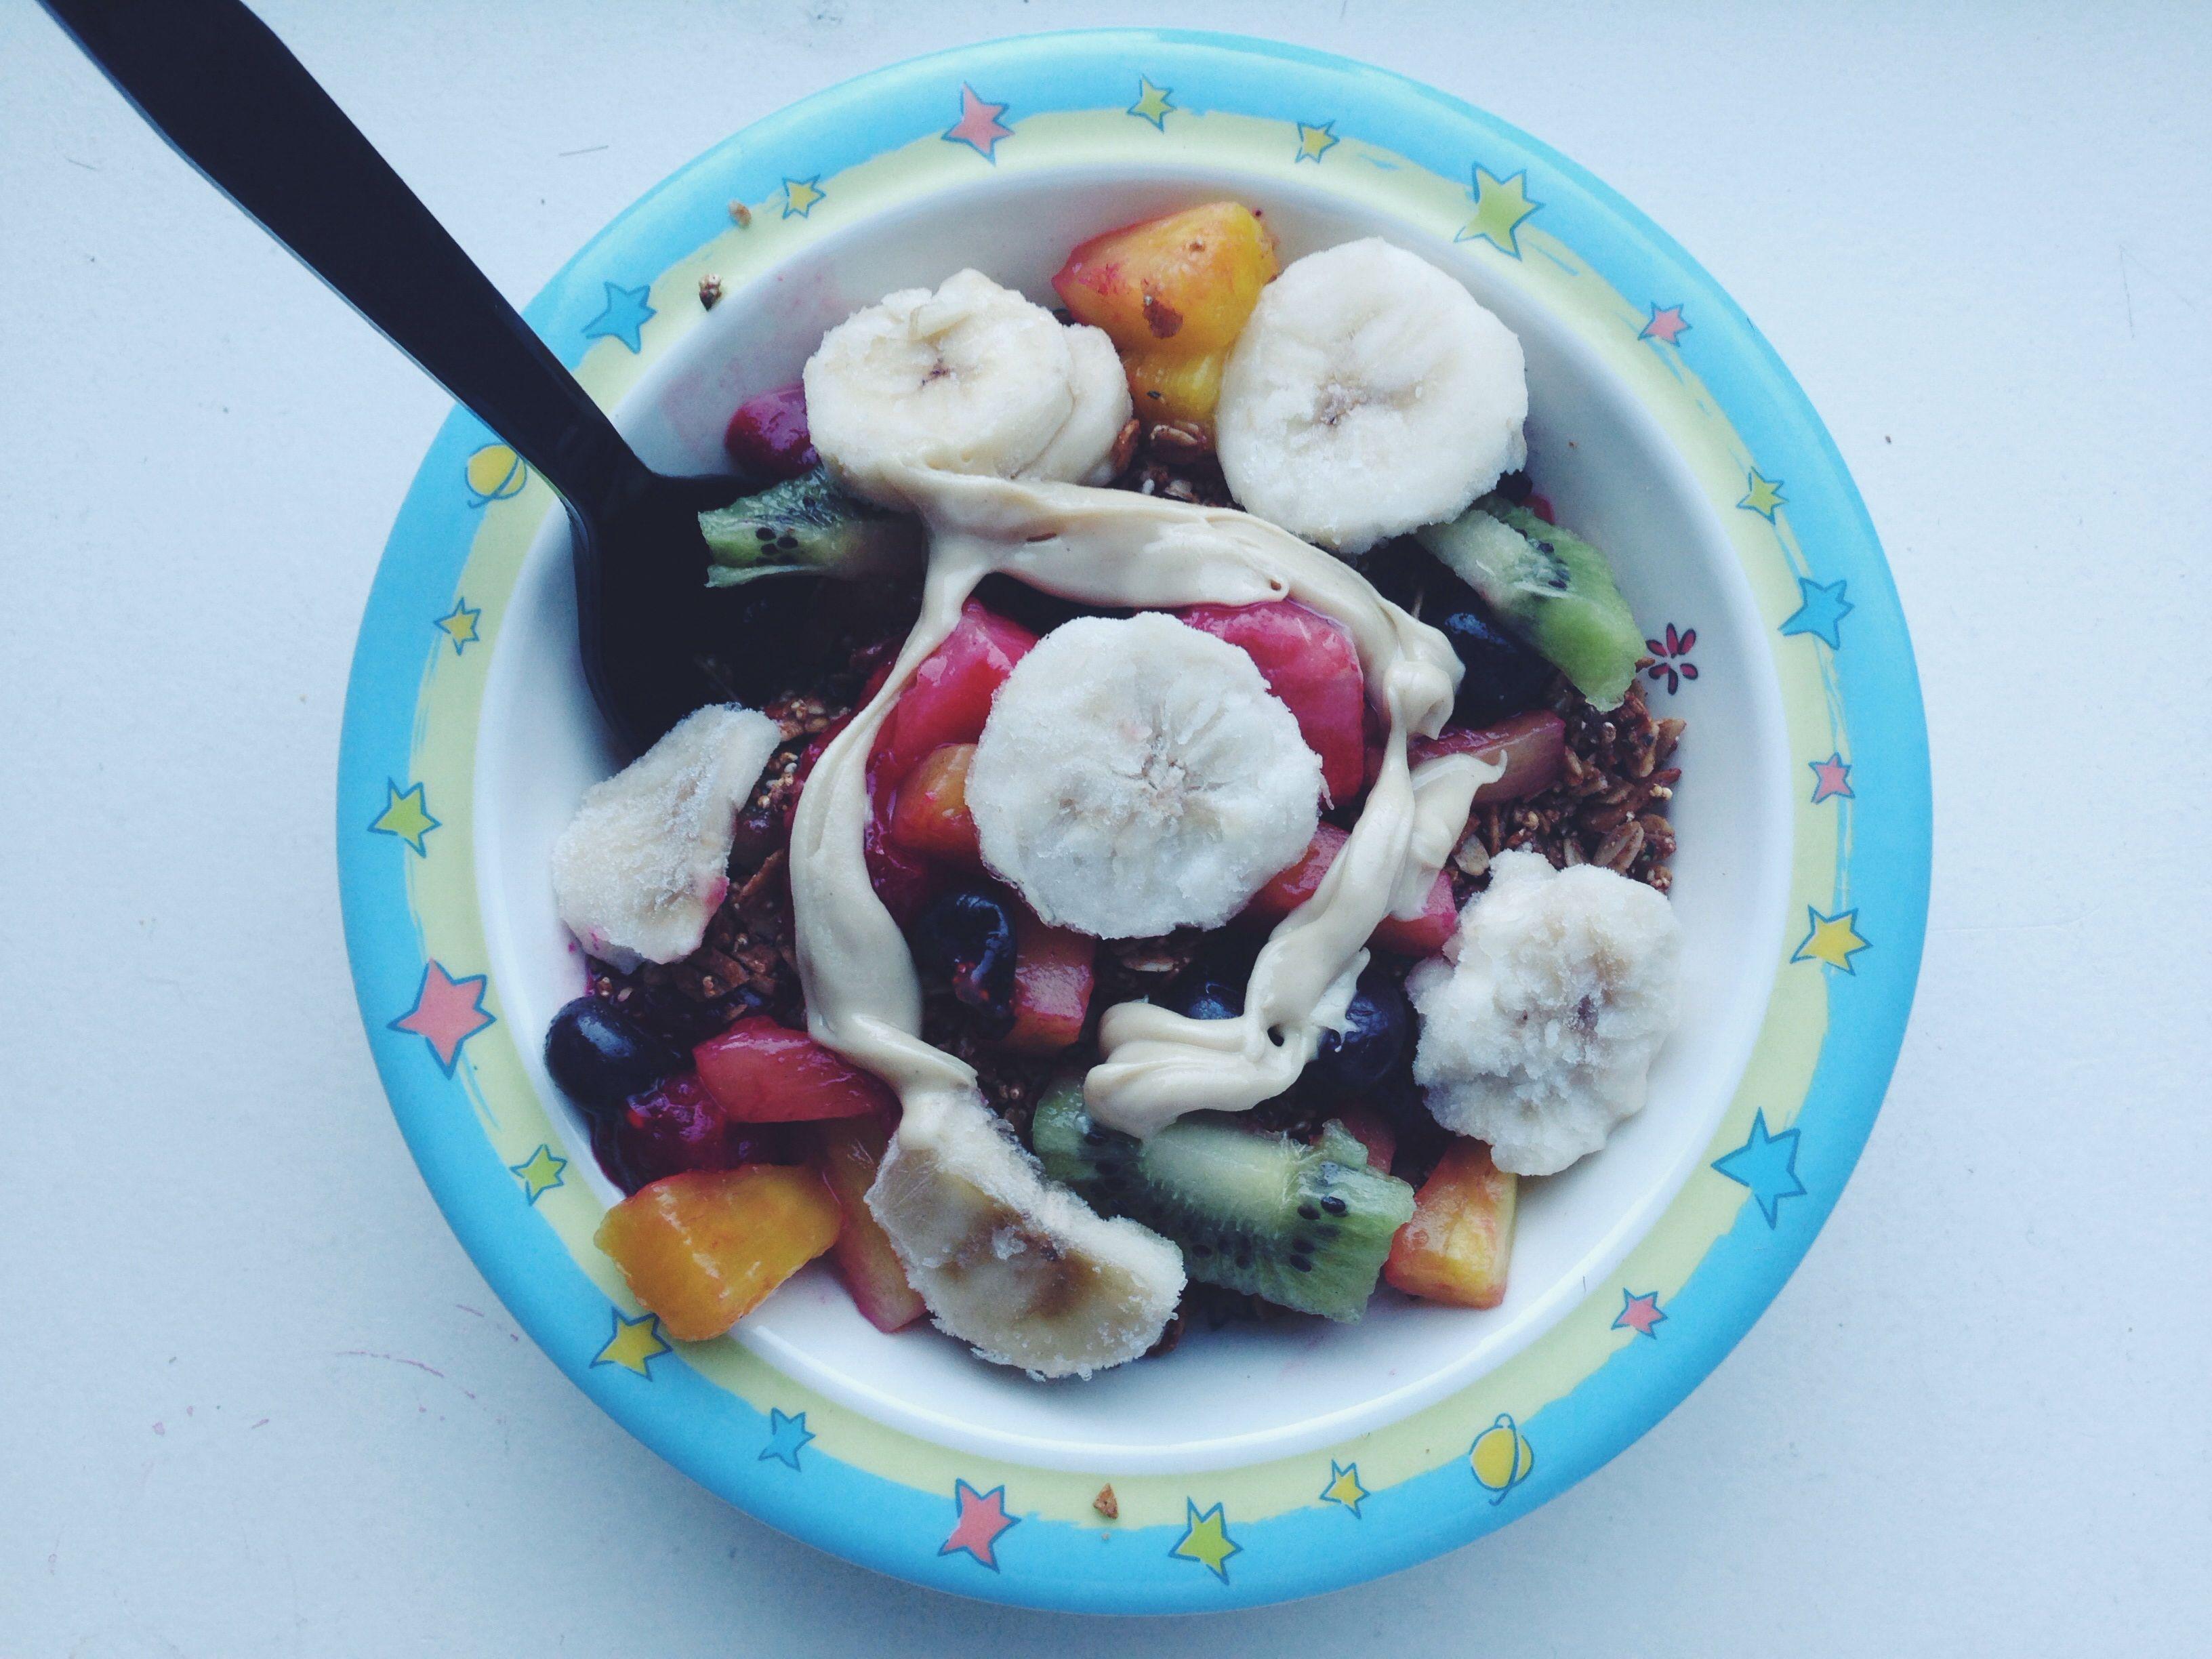 My Friday breakfast. -- 1/3 cup blueberry hemp Purely Elizabeth granola, some plain SoDelicious coconut yogurt, a kiwi, mixed berries, some frozen banana slices and a tbsp of Artisana cashew butter. #dairyfree #vegan #glutenfree